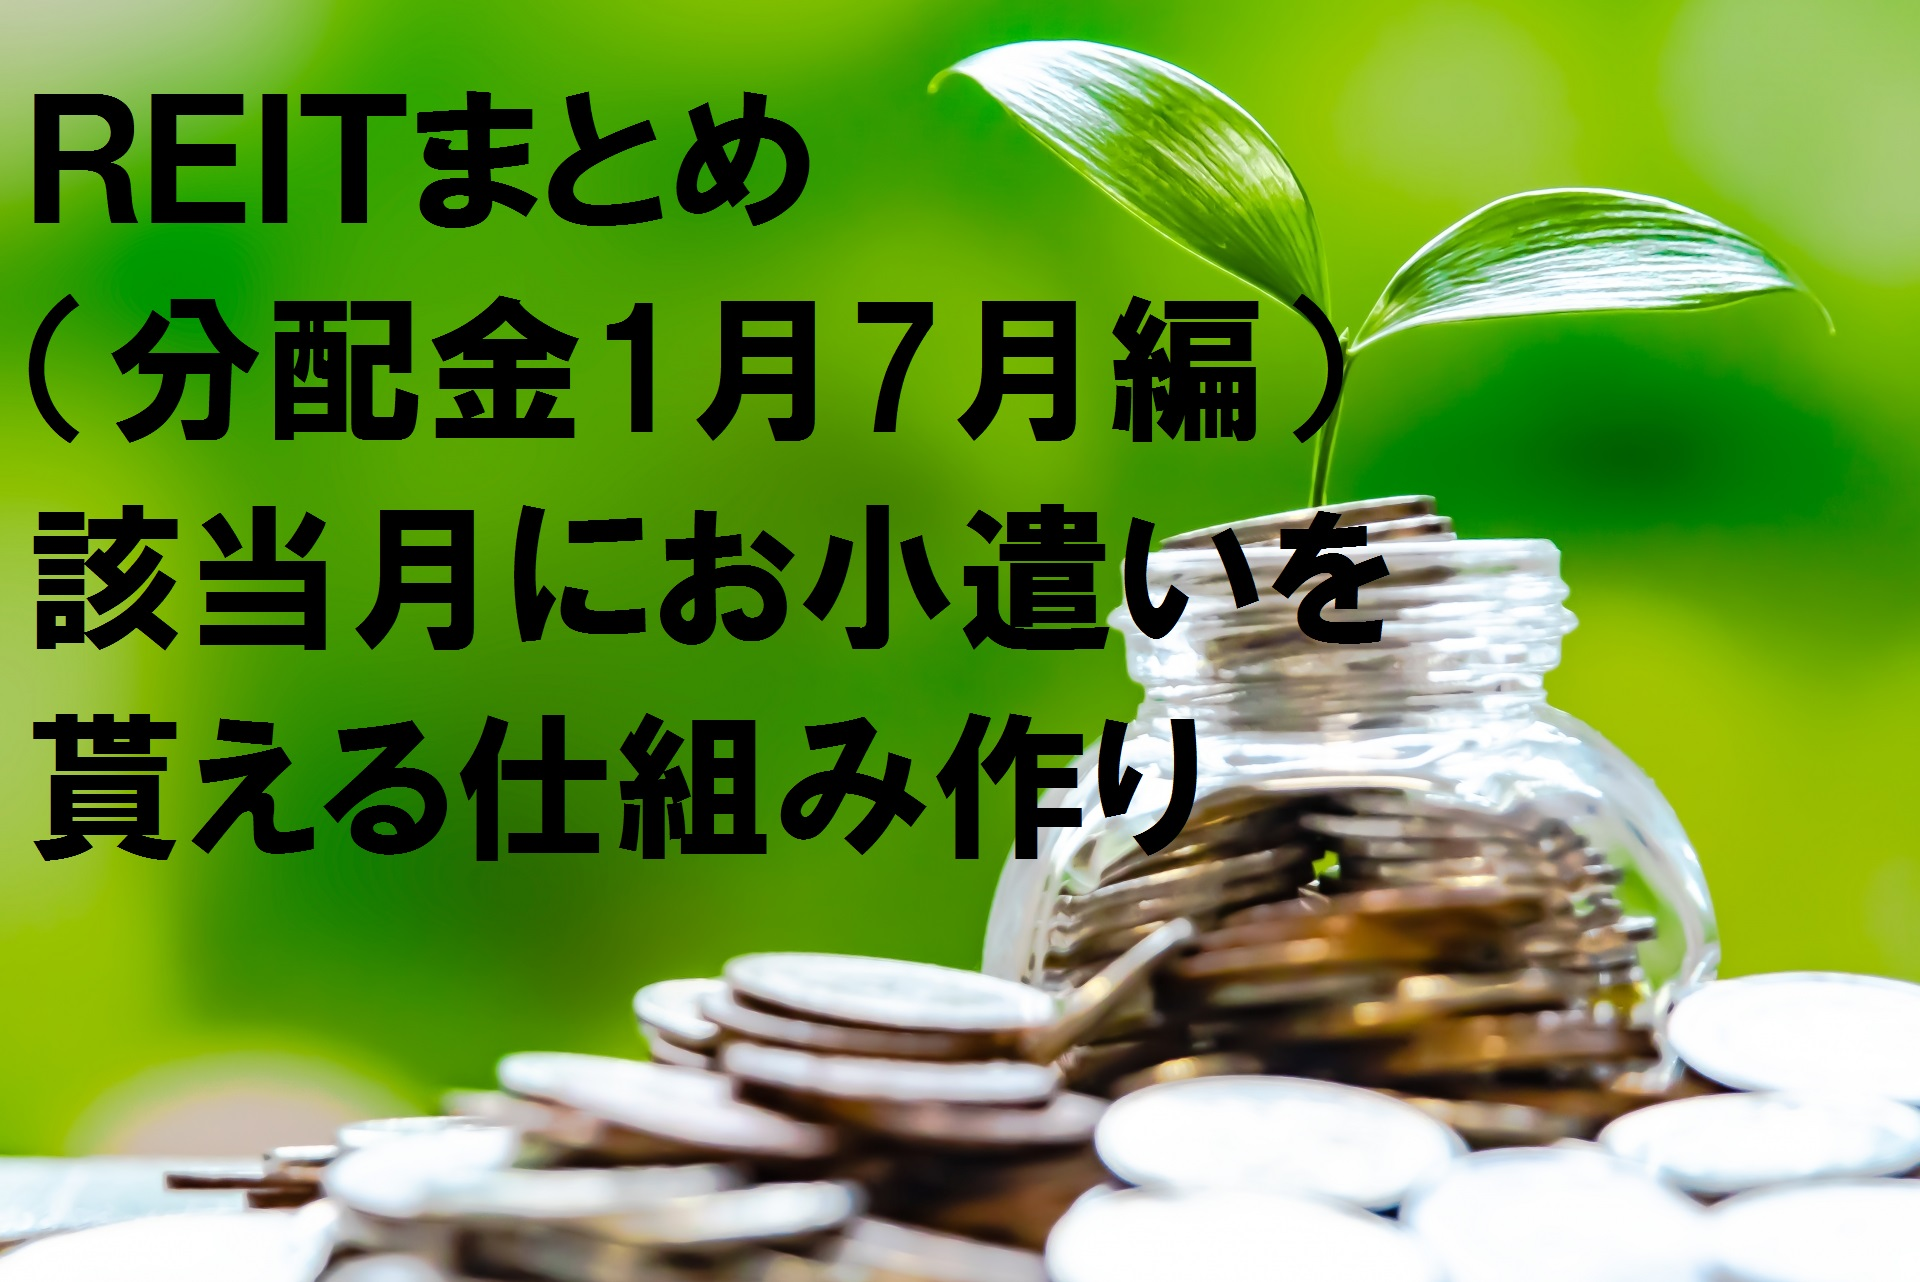 REITまとめ(分配金1月7月編)該当月にお小遣いを貰える仕組み作り